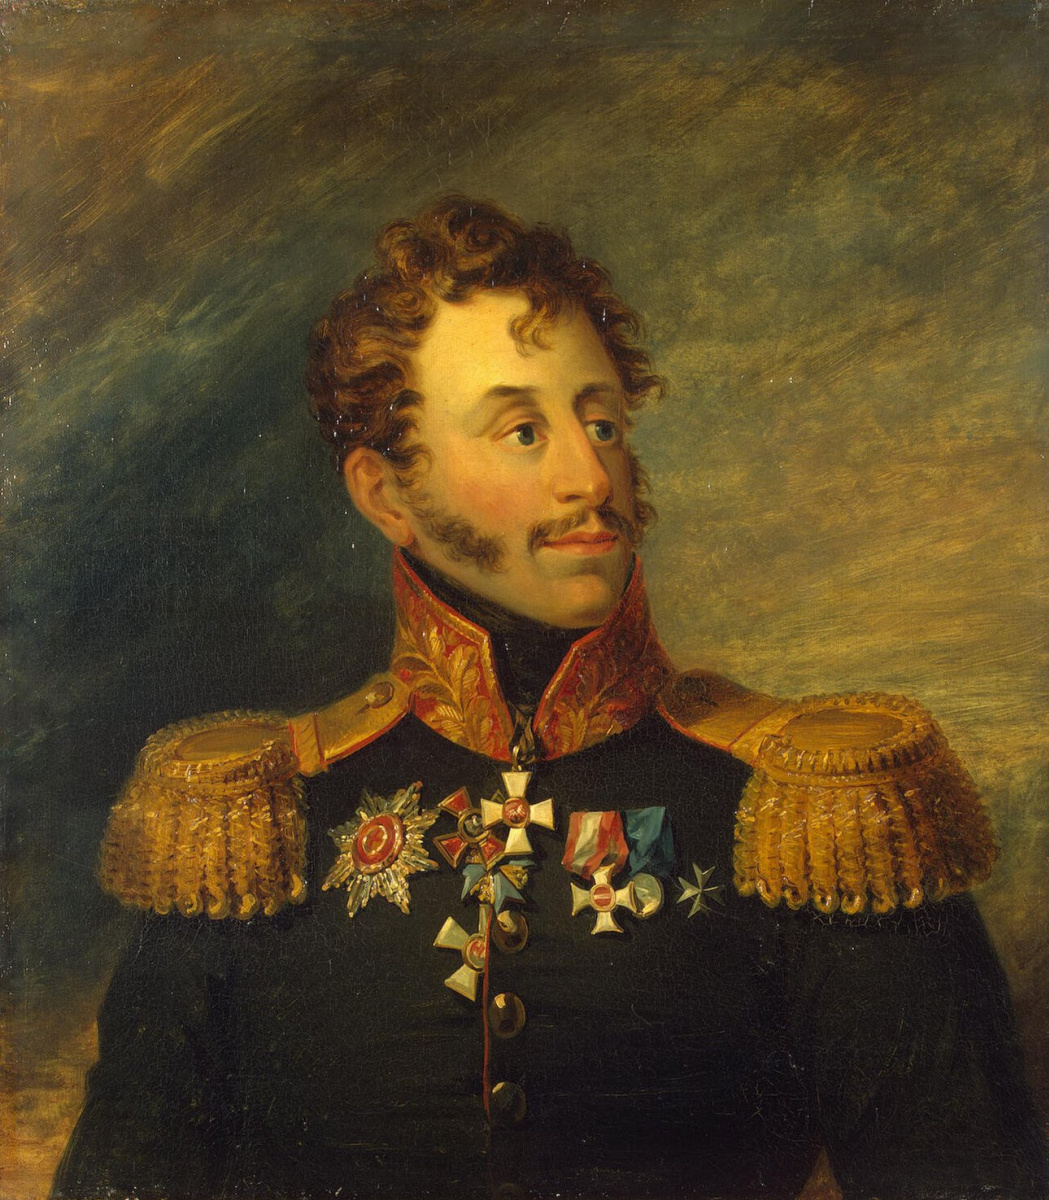 Джордж Доу. Портрет Карла Богдановича фон Кнорринга